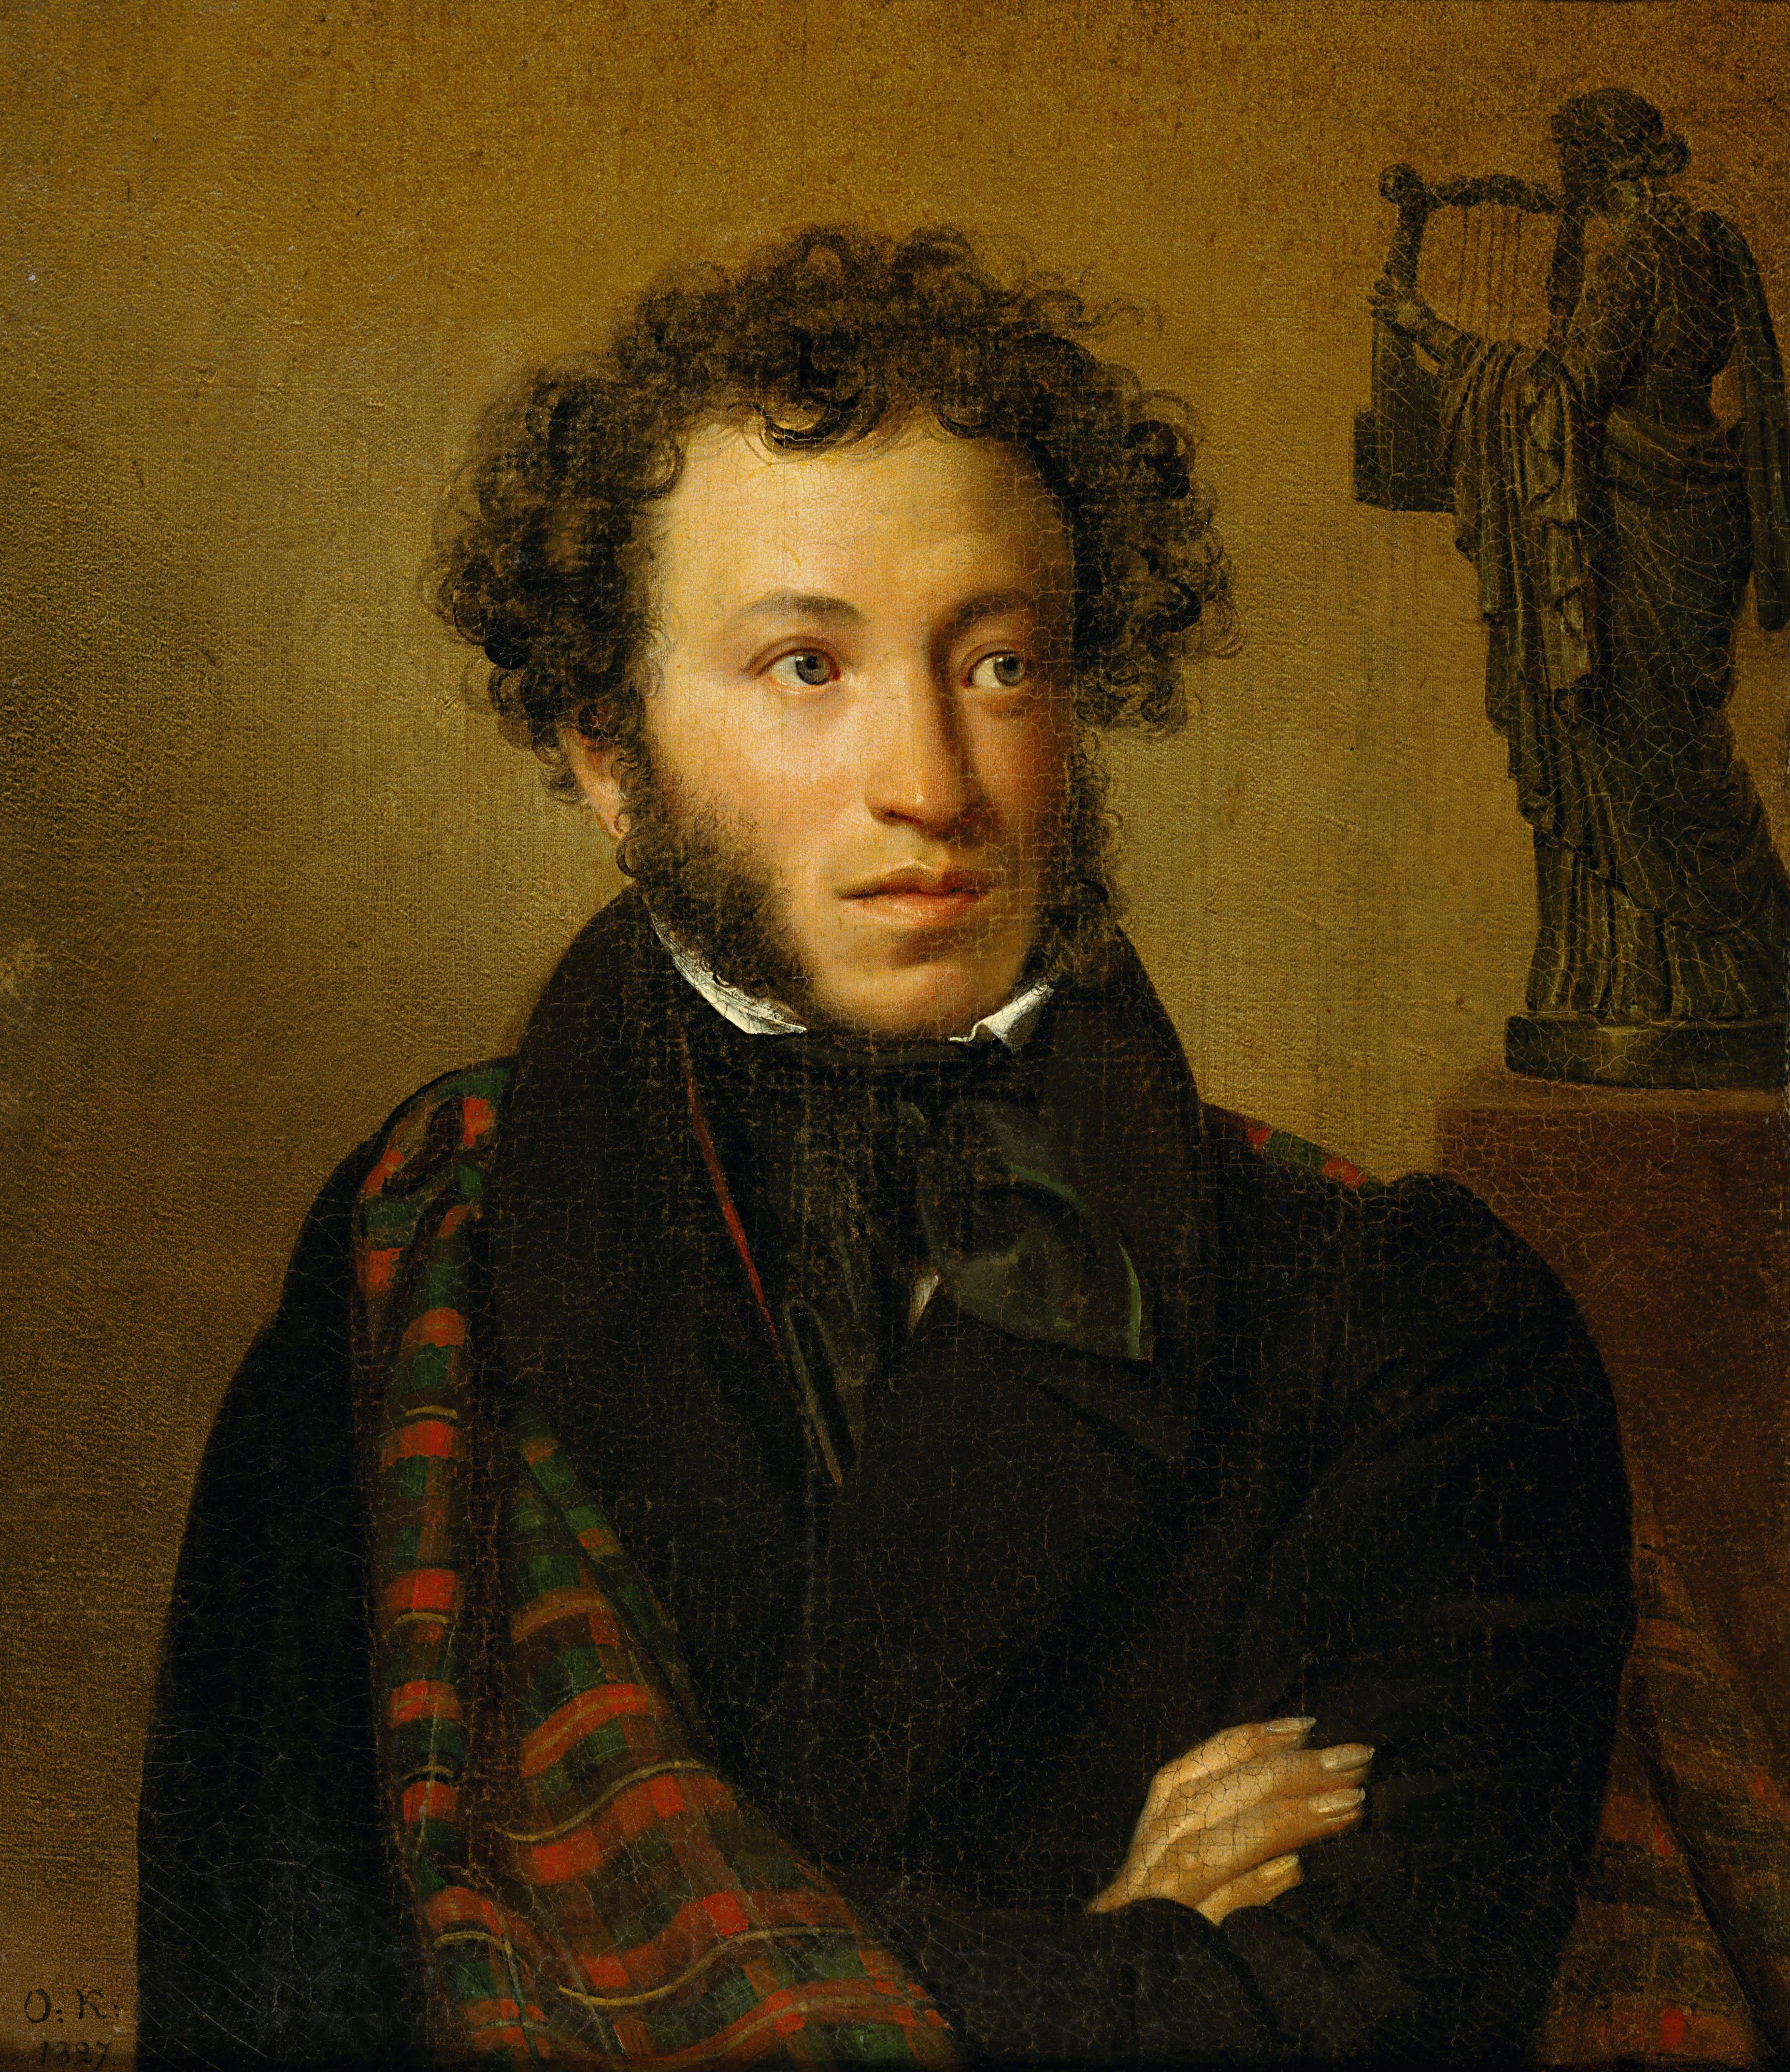 Portret-poeta-Aleksandra-Sergeevicha-Pushkina.-1827